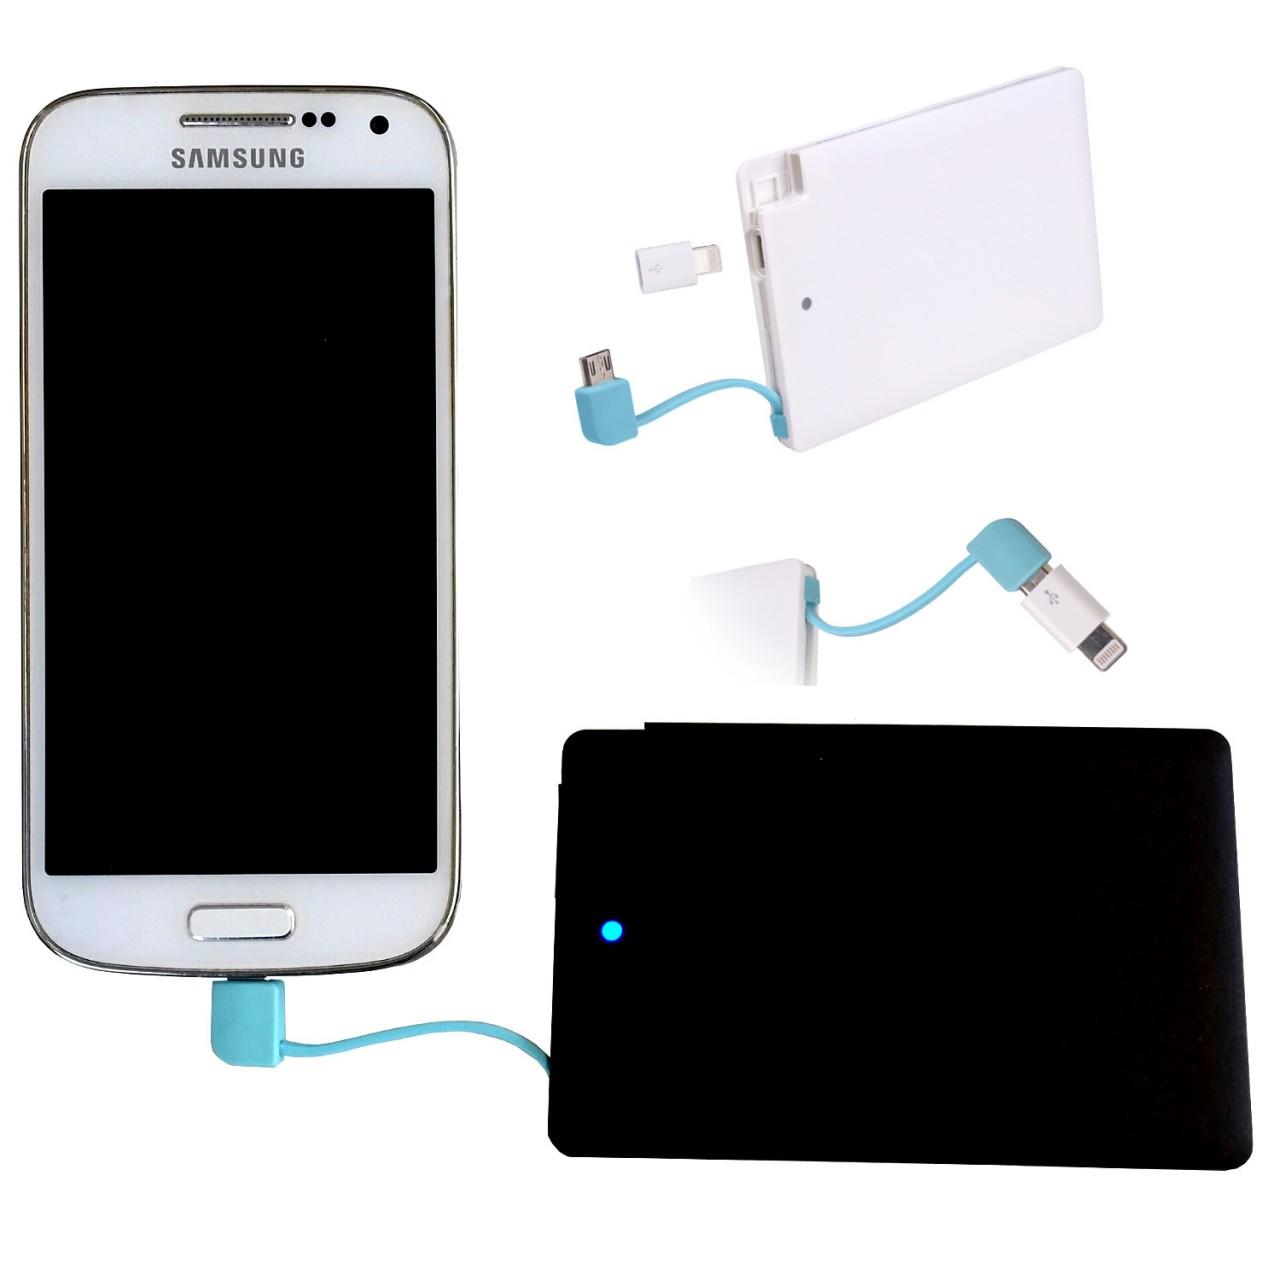 Powerbank SLIM mobiler Akku 2600mAh Ladegerät USB Handy Smartphone ultra flach